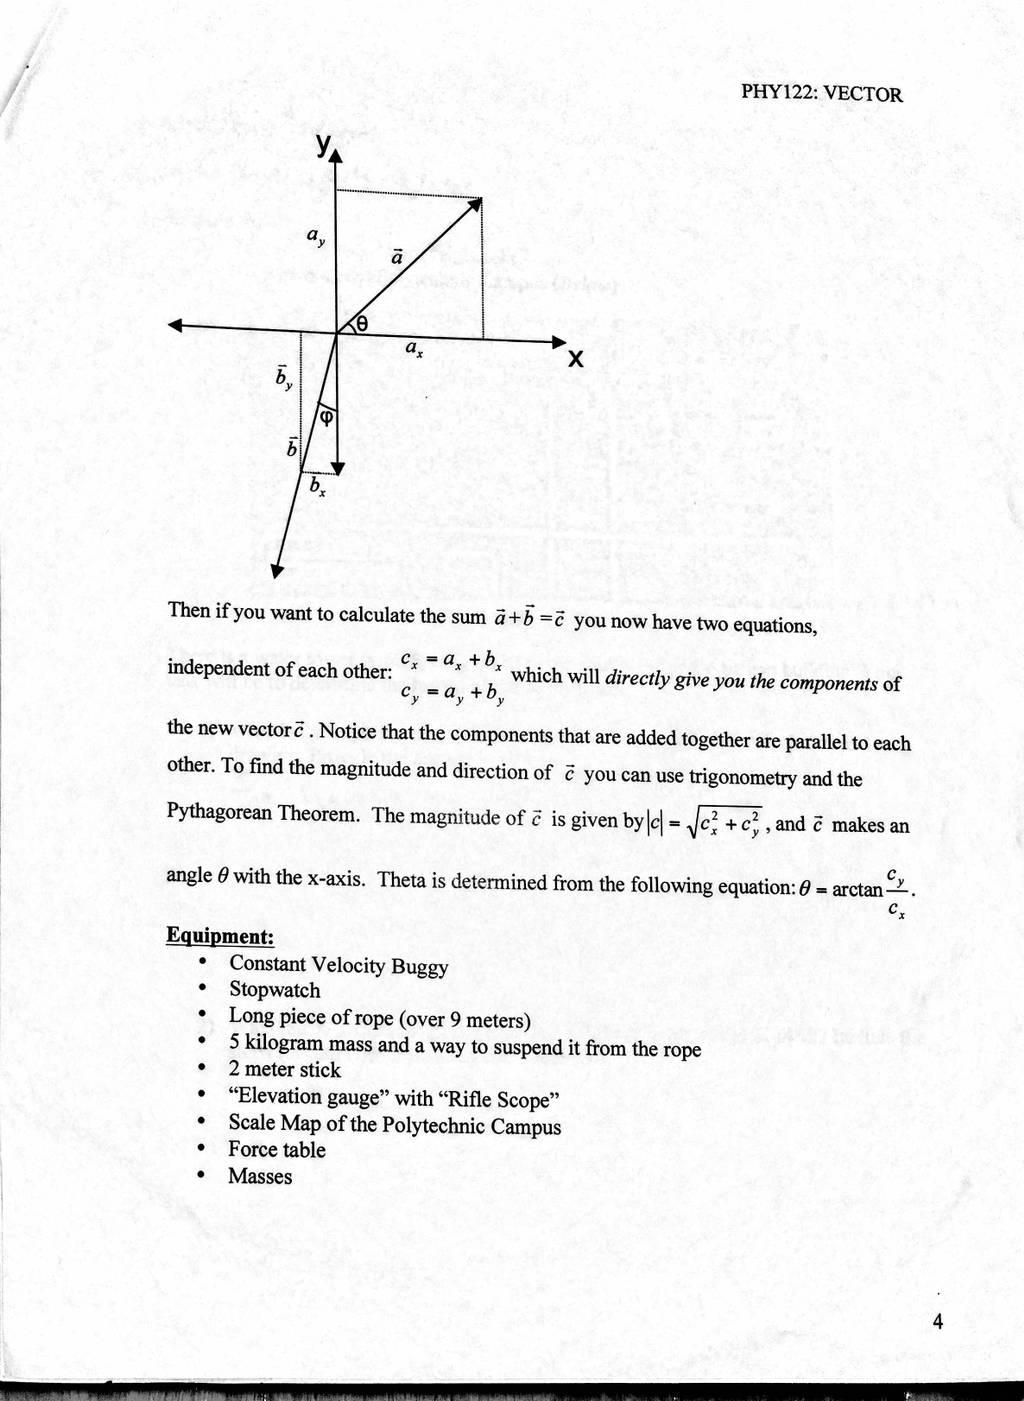 physics lab physics lab report help help